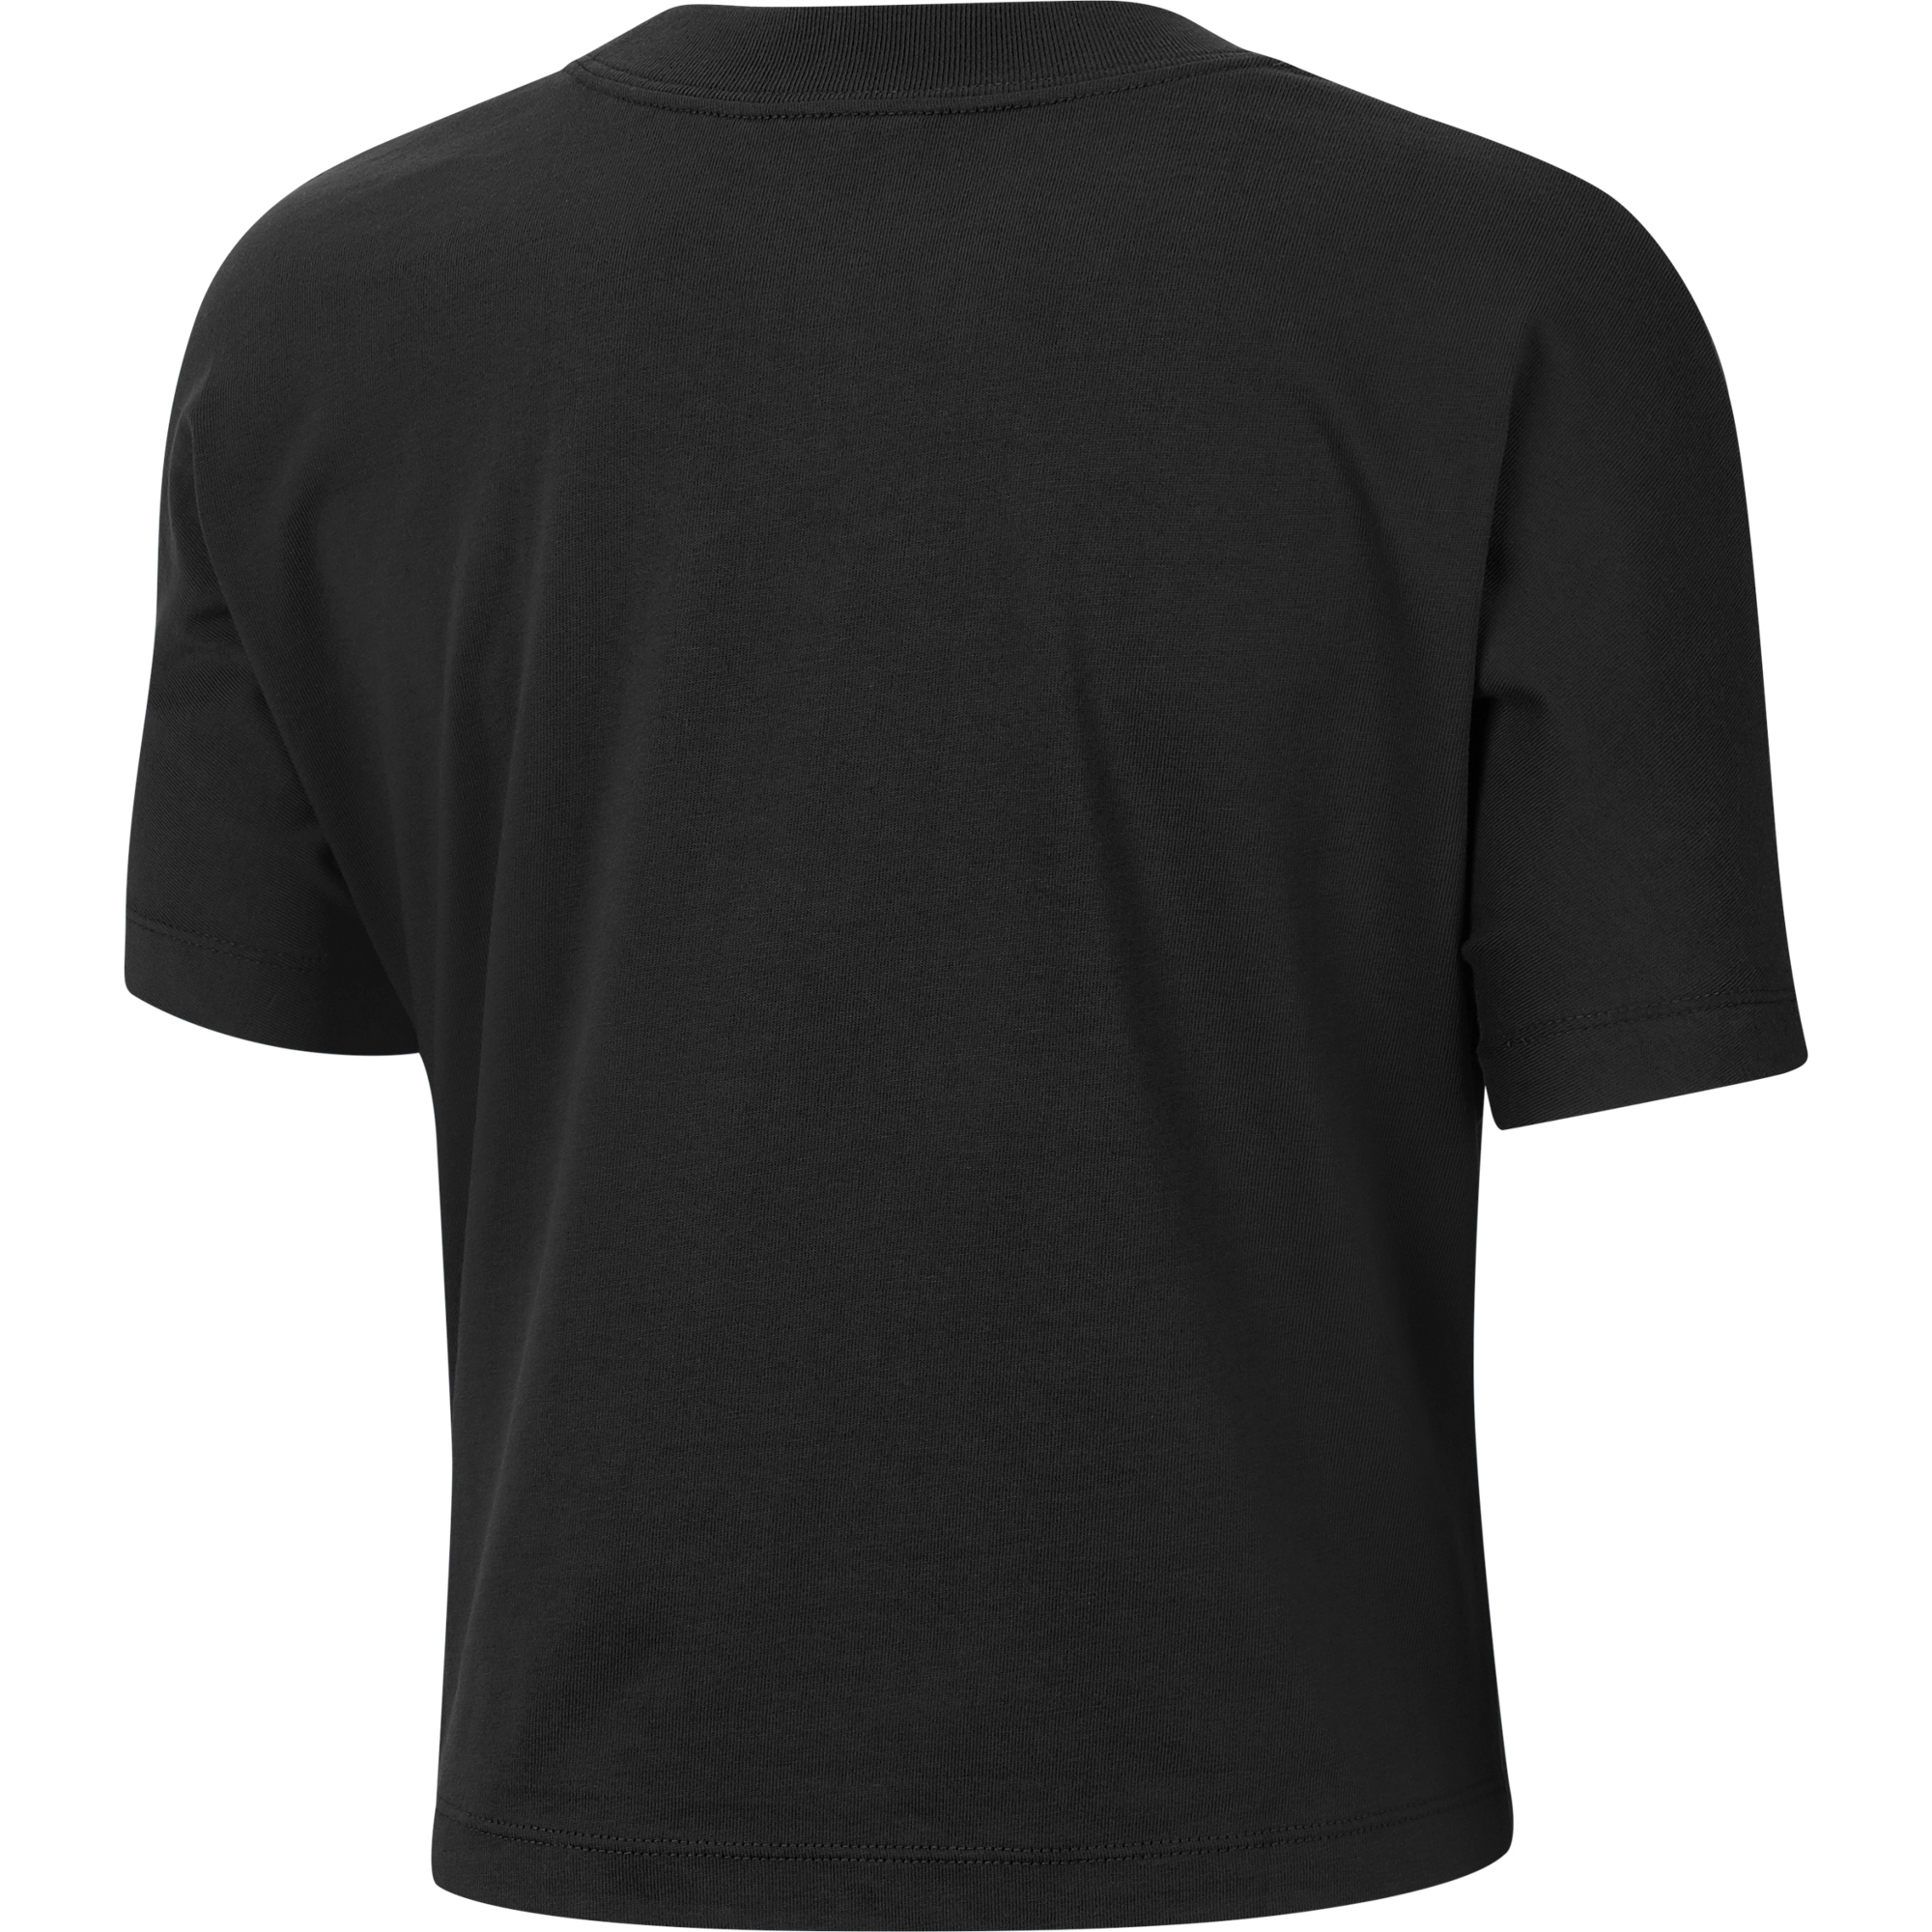 Nike Sportswear Swoosh Kadın Siyah T-Shirt